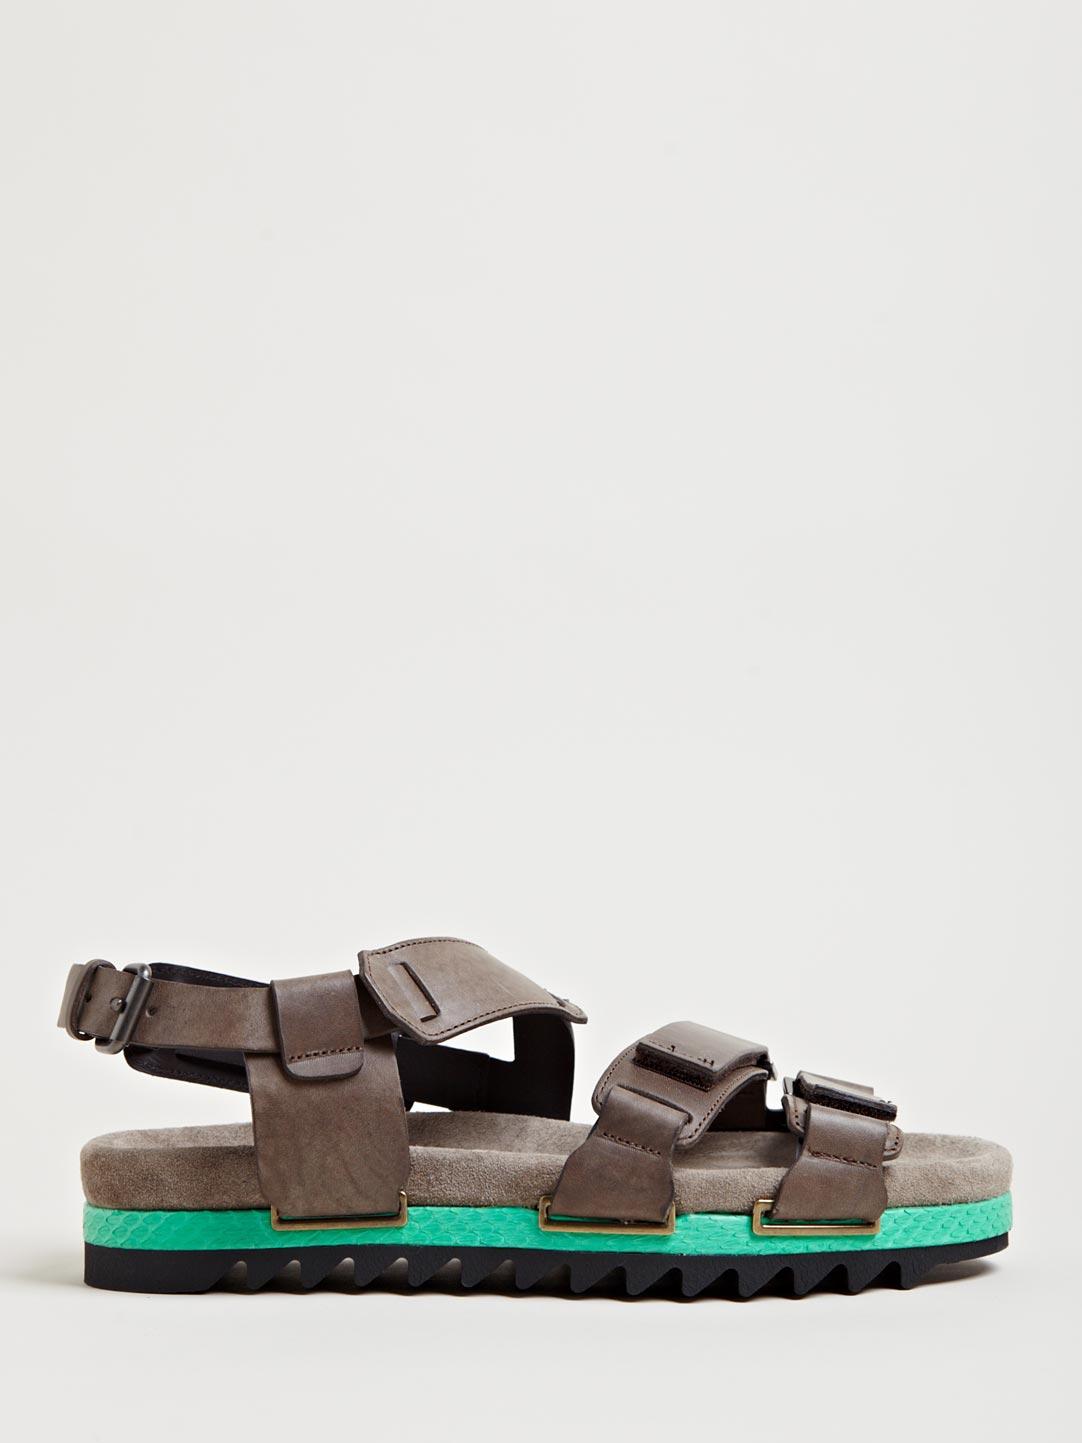 Lyst Lanvin Mens Three Strap Sandals In Gray For Men